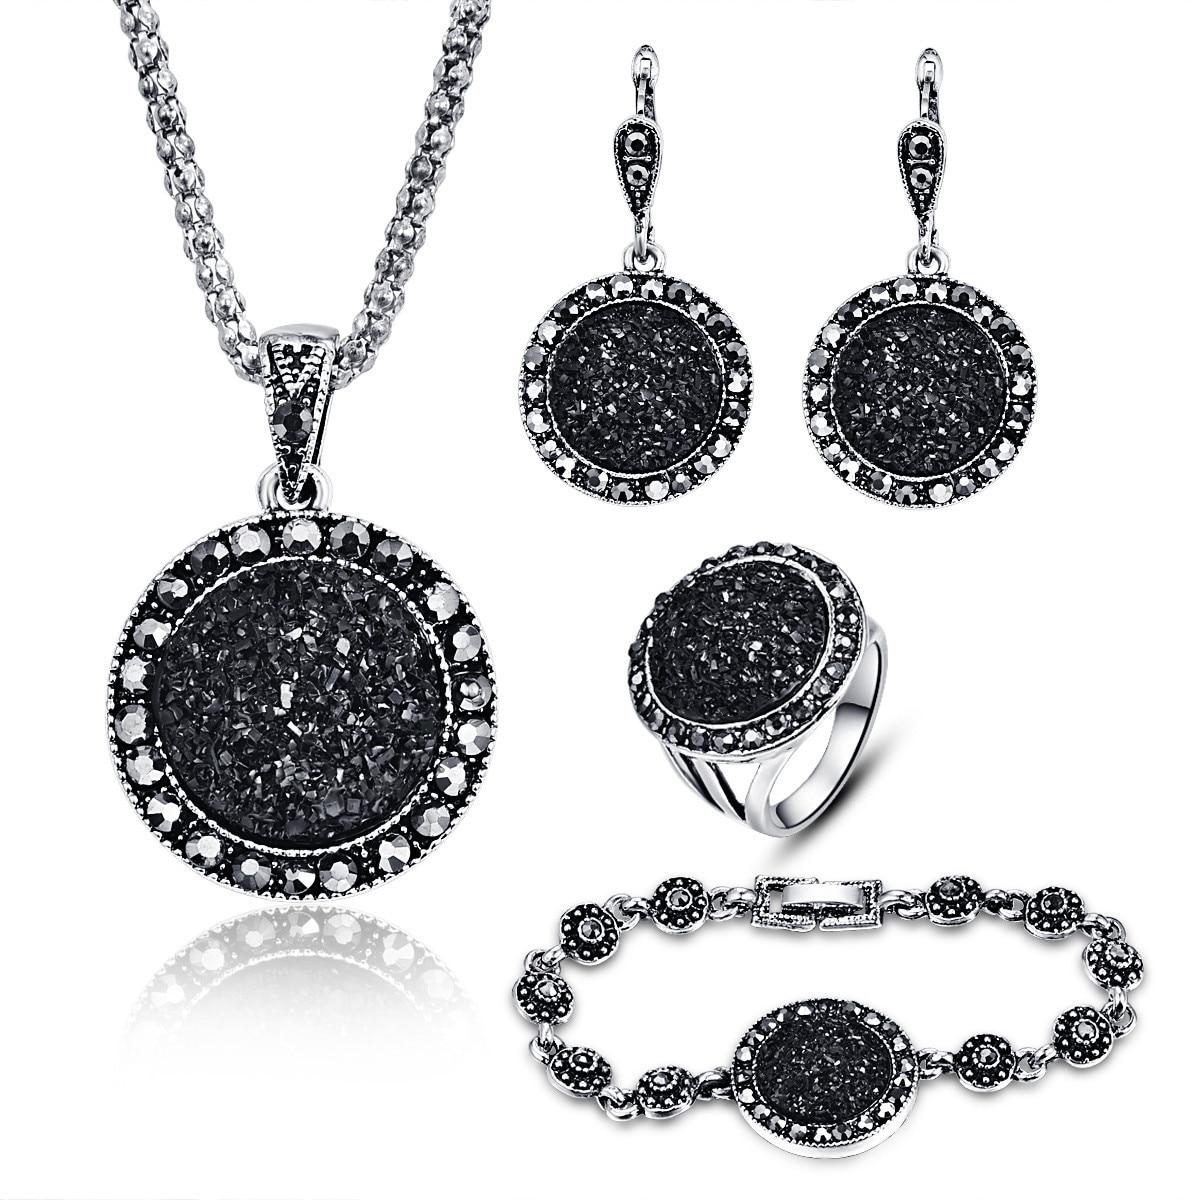 Womens fashion black round gravel resin necklace bracelet earrings ring four setWomens fashion black round gravel resin necklace bracelet earrings ring four set